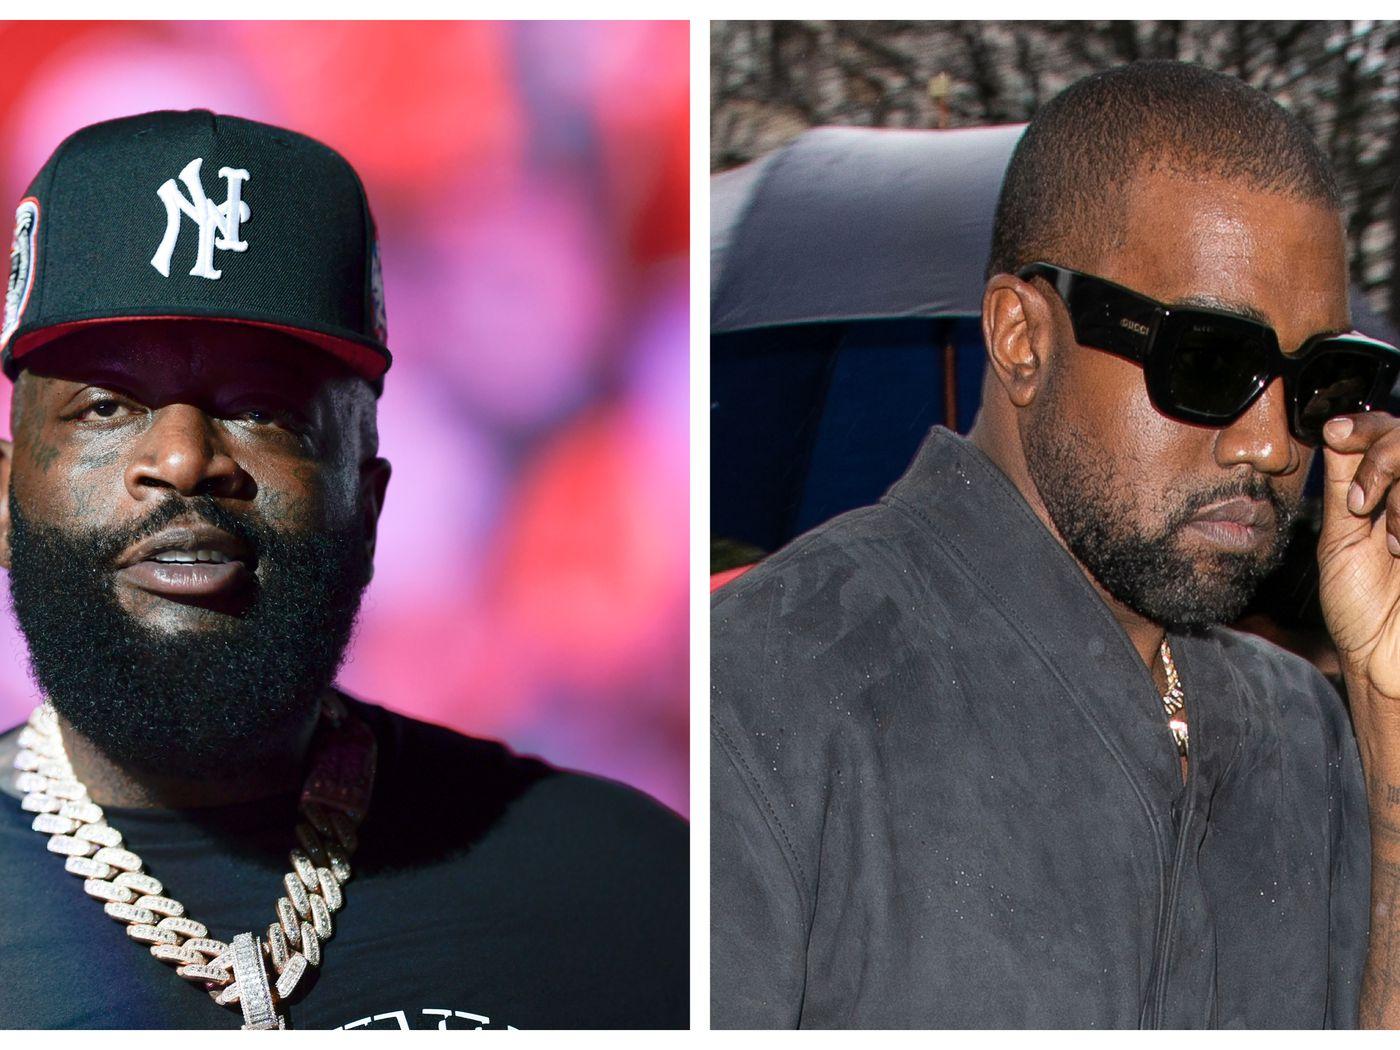 Left: Rick Ross | Right: Kanye West